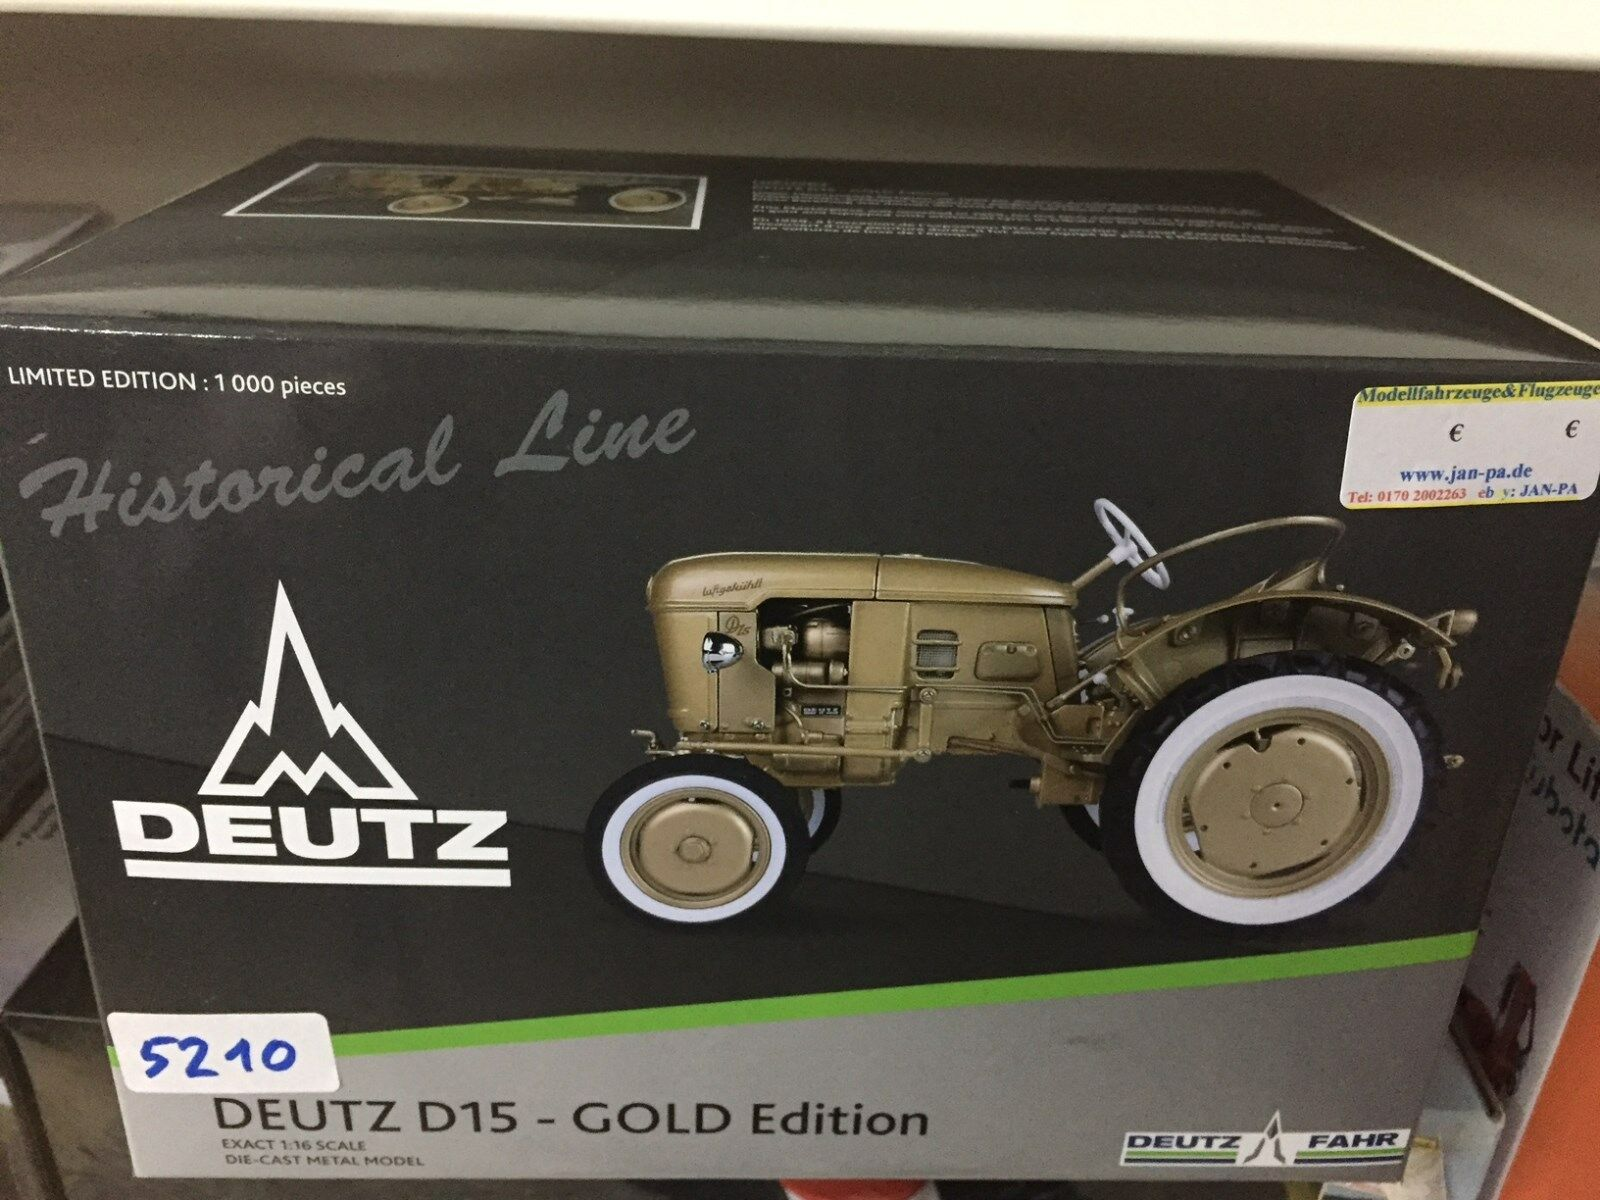 5210 DEUTZ d15 or Version Limited Edition, 1 16 Universal Hobbies